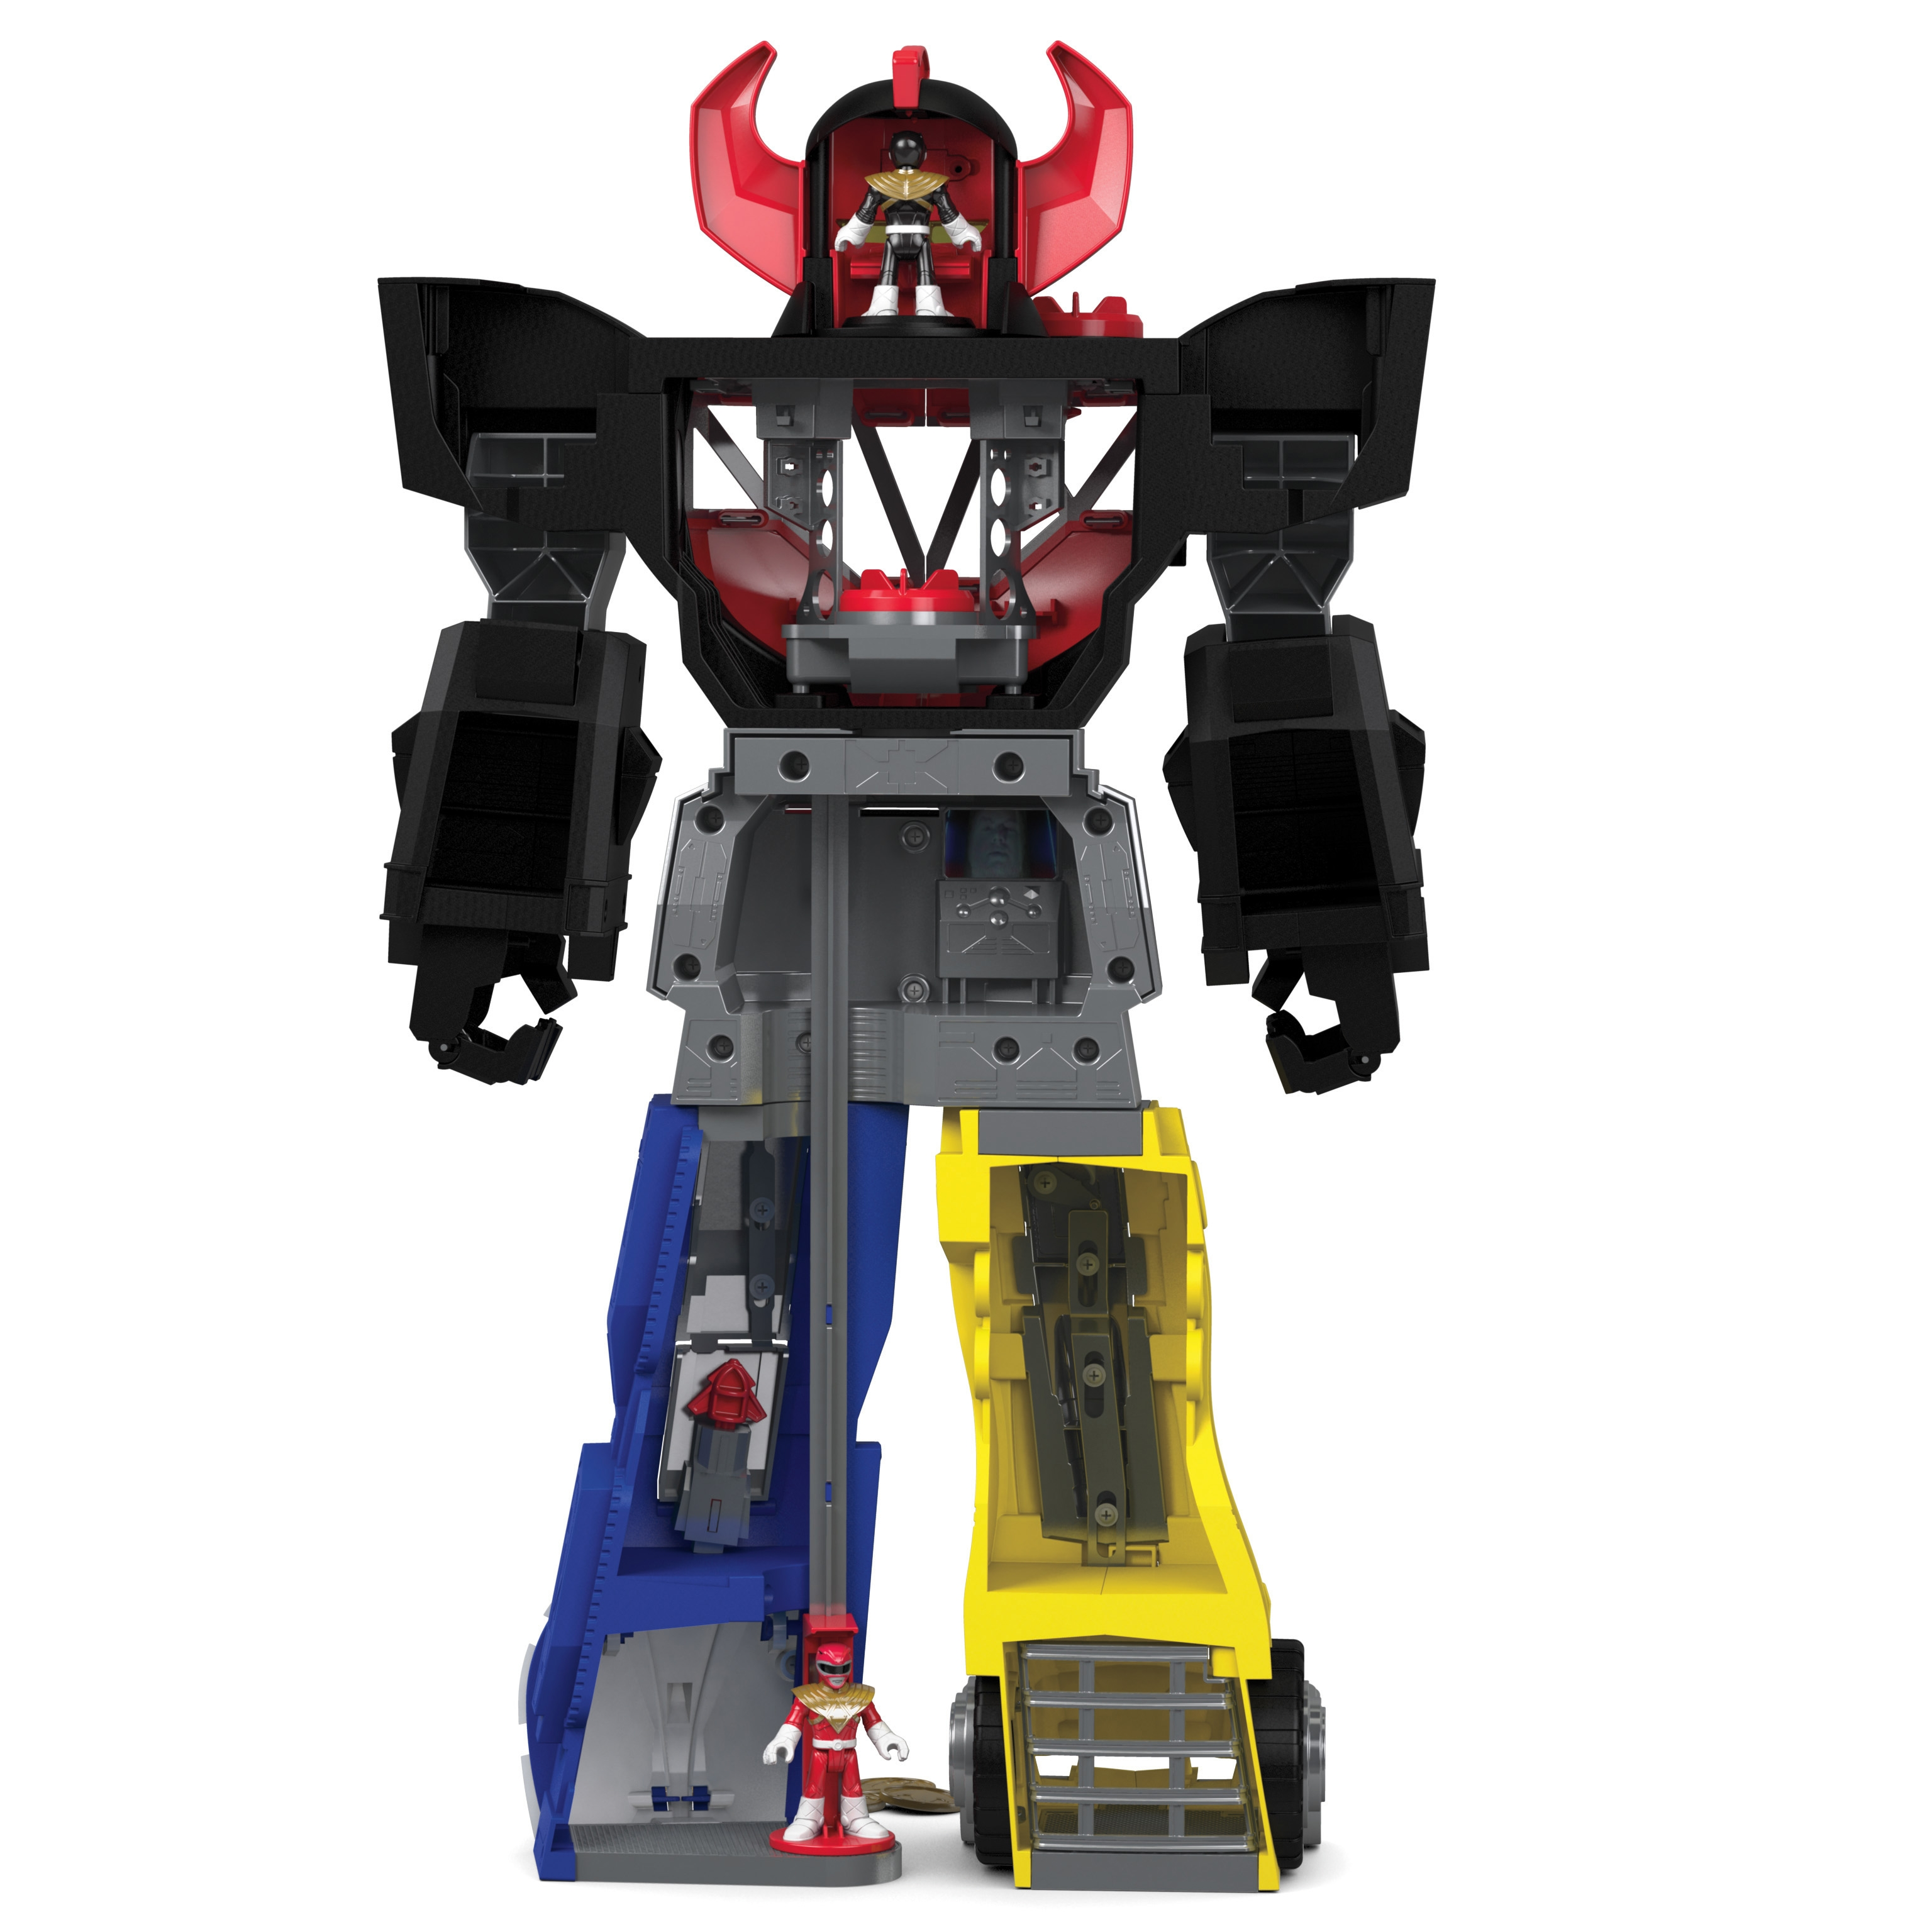 3072x3072 Imaginext Power Rangers Morphin Megazord